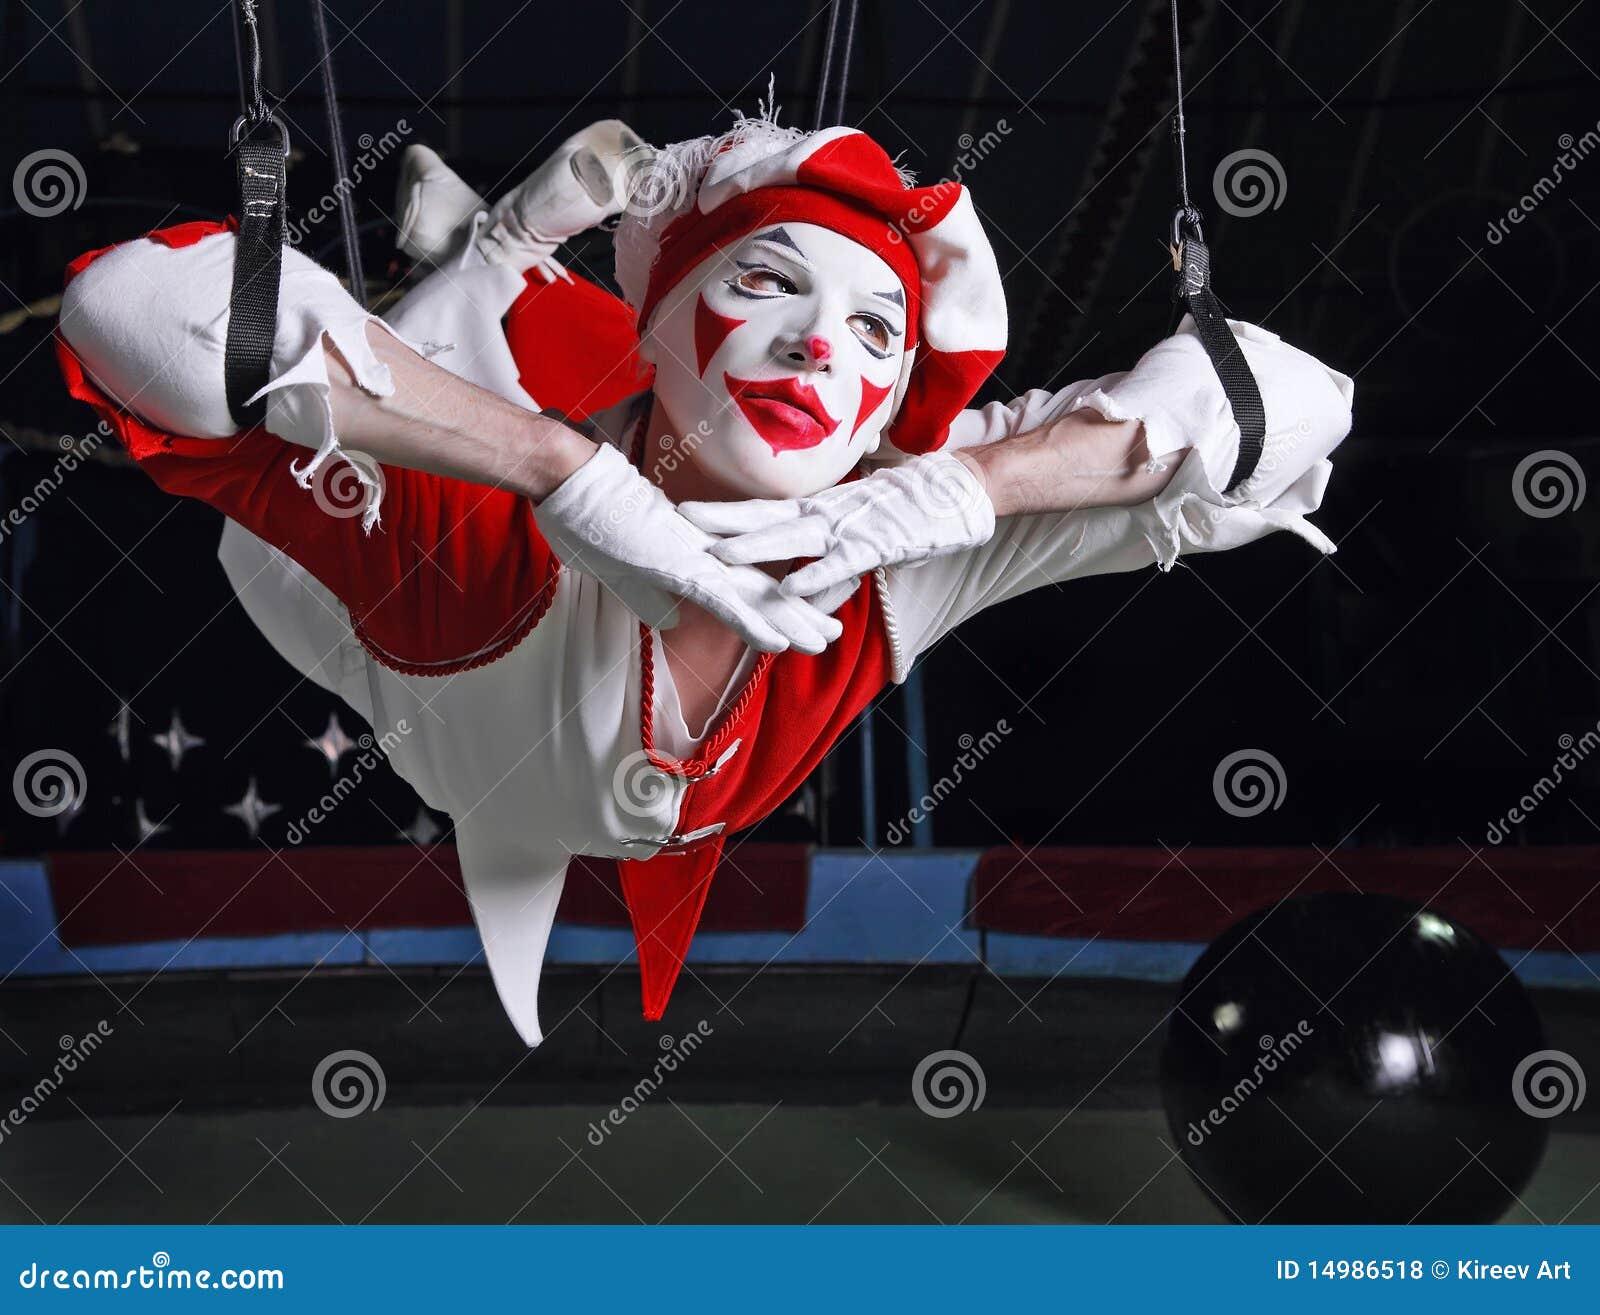 Lotniczy akrobata cyrk